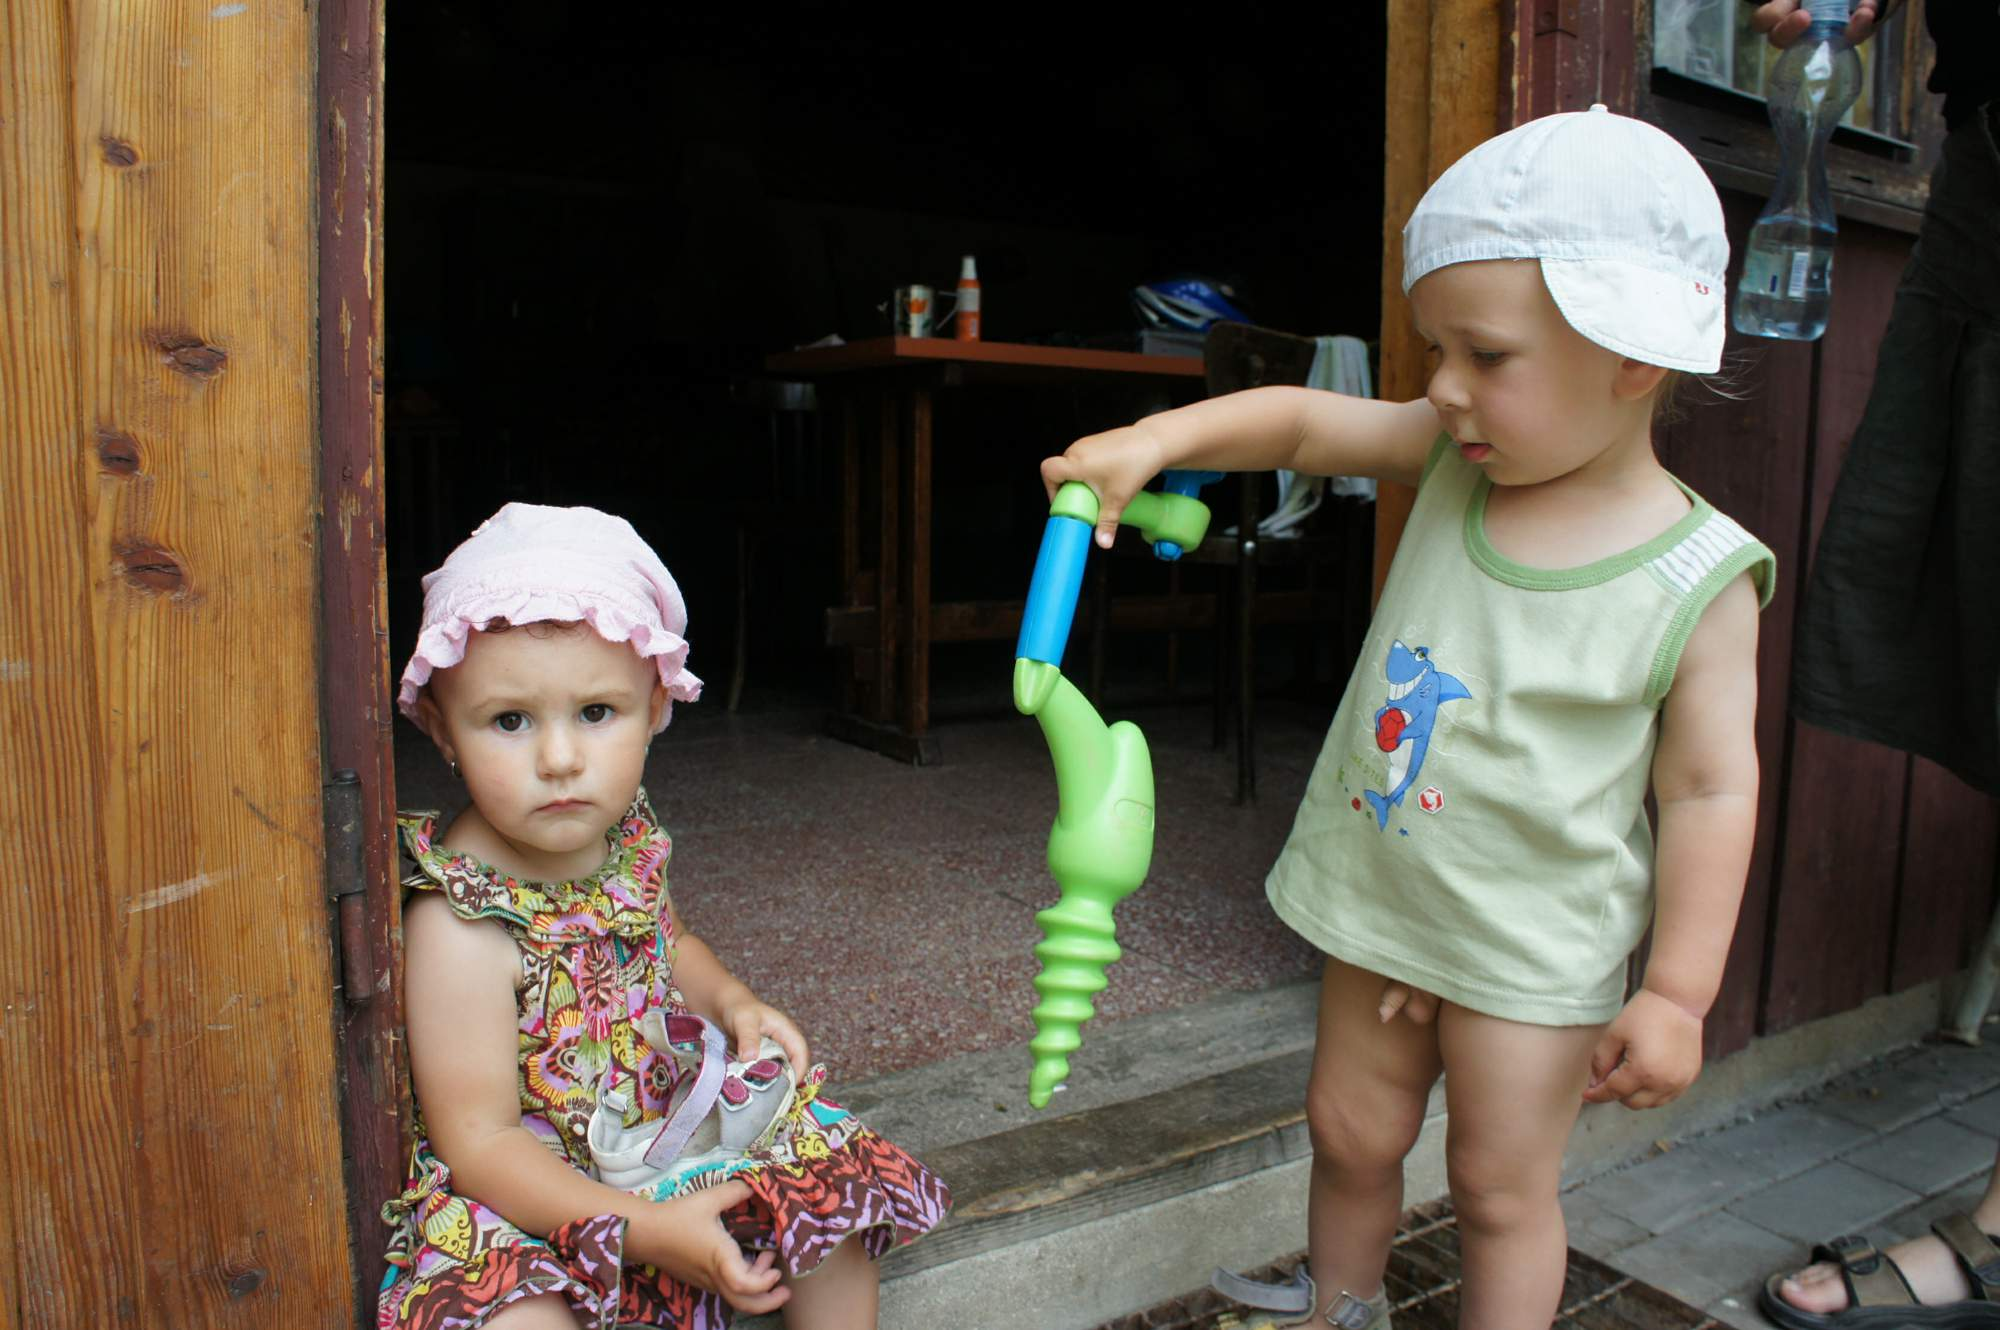 .rajce.idnes.cz girl children 5